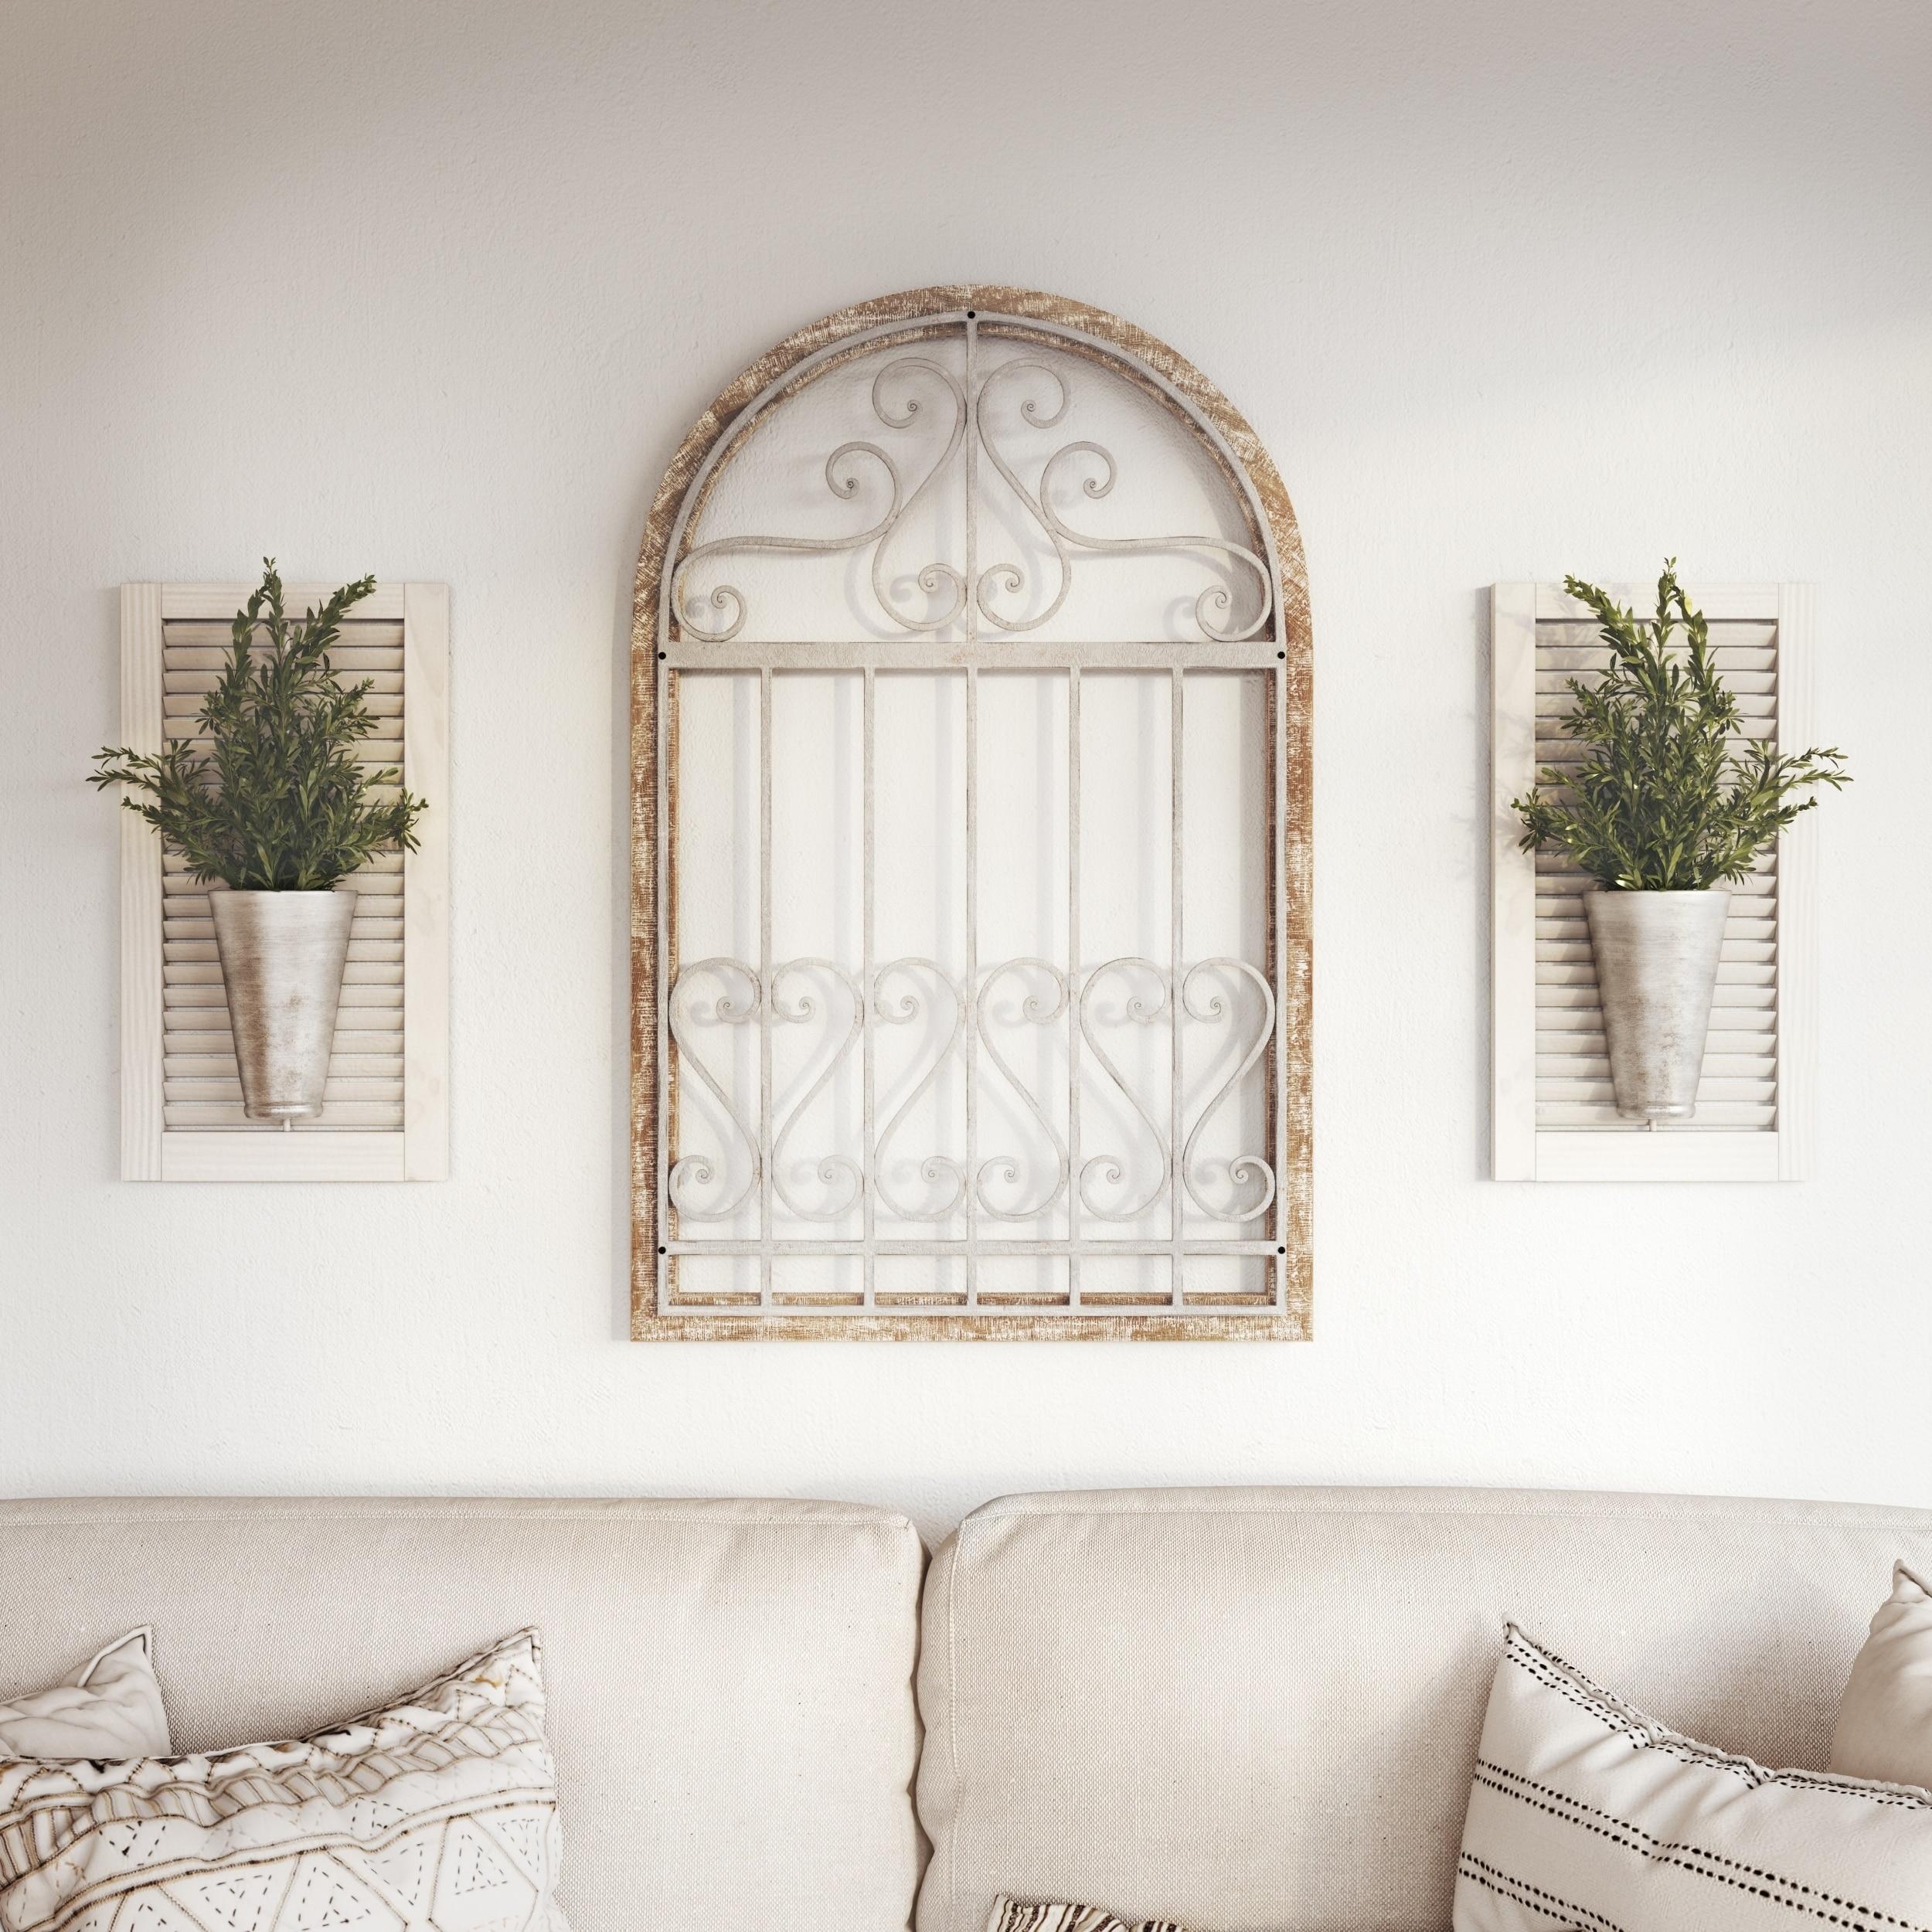 Wall Decor For Gray Living Room from ak1.ostkcdn.com